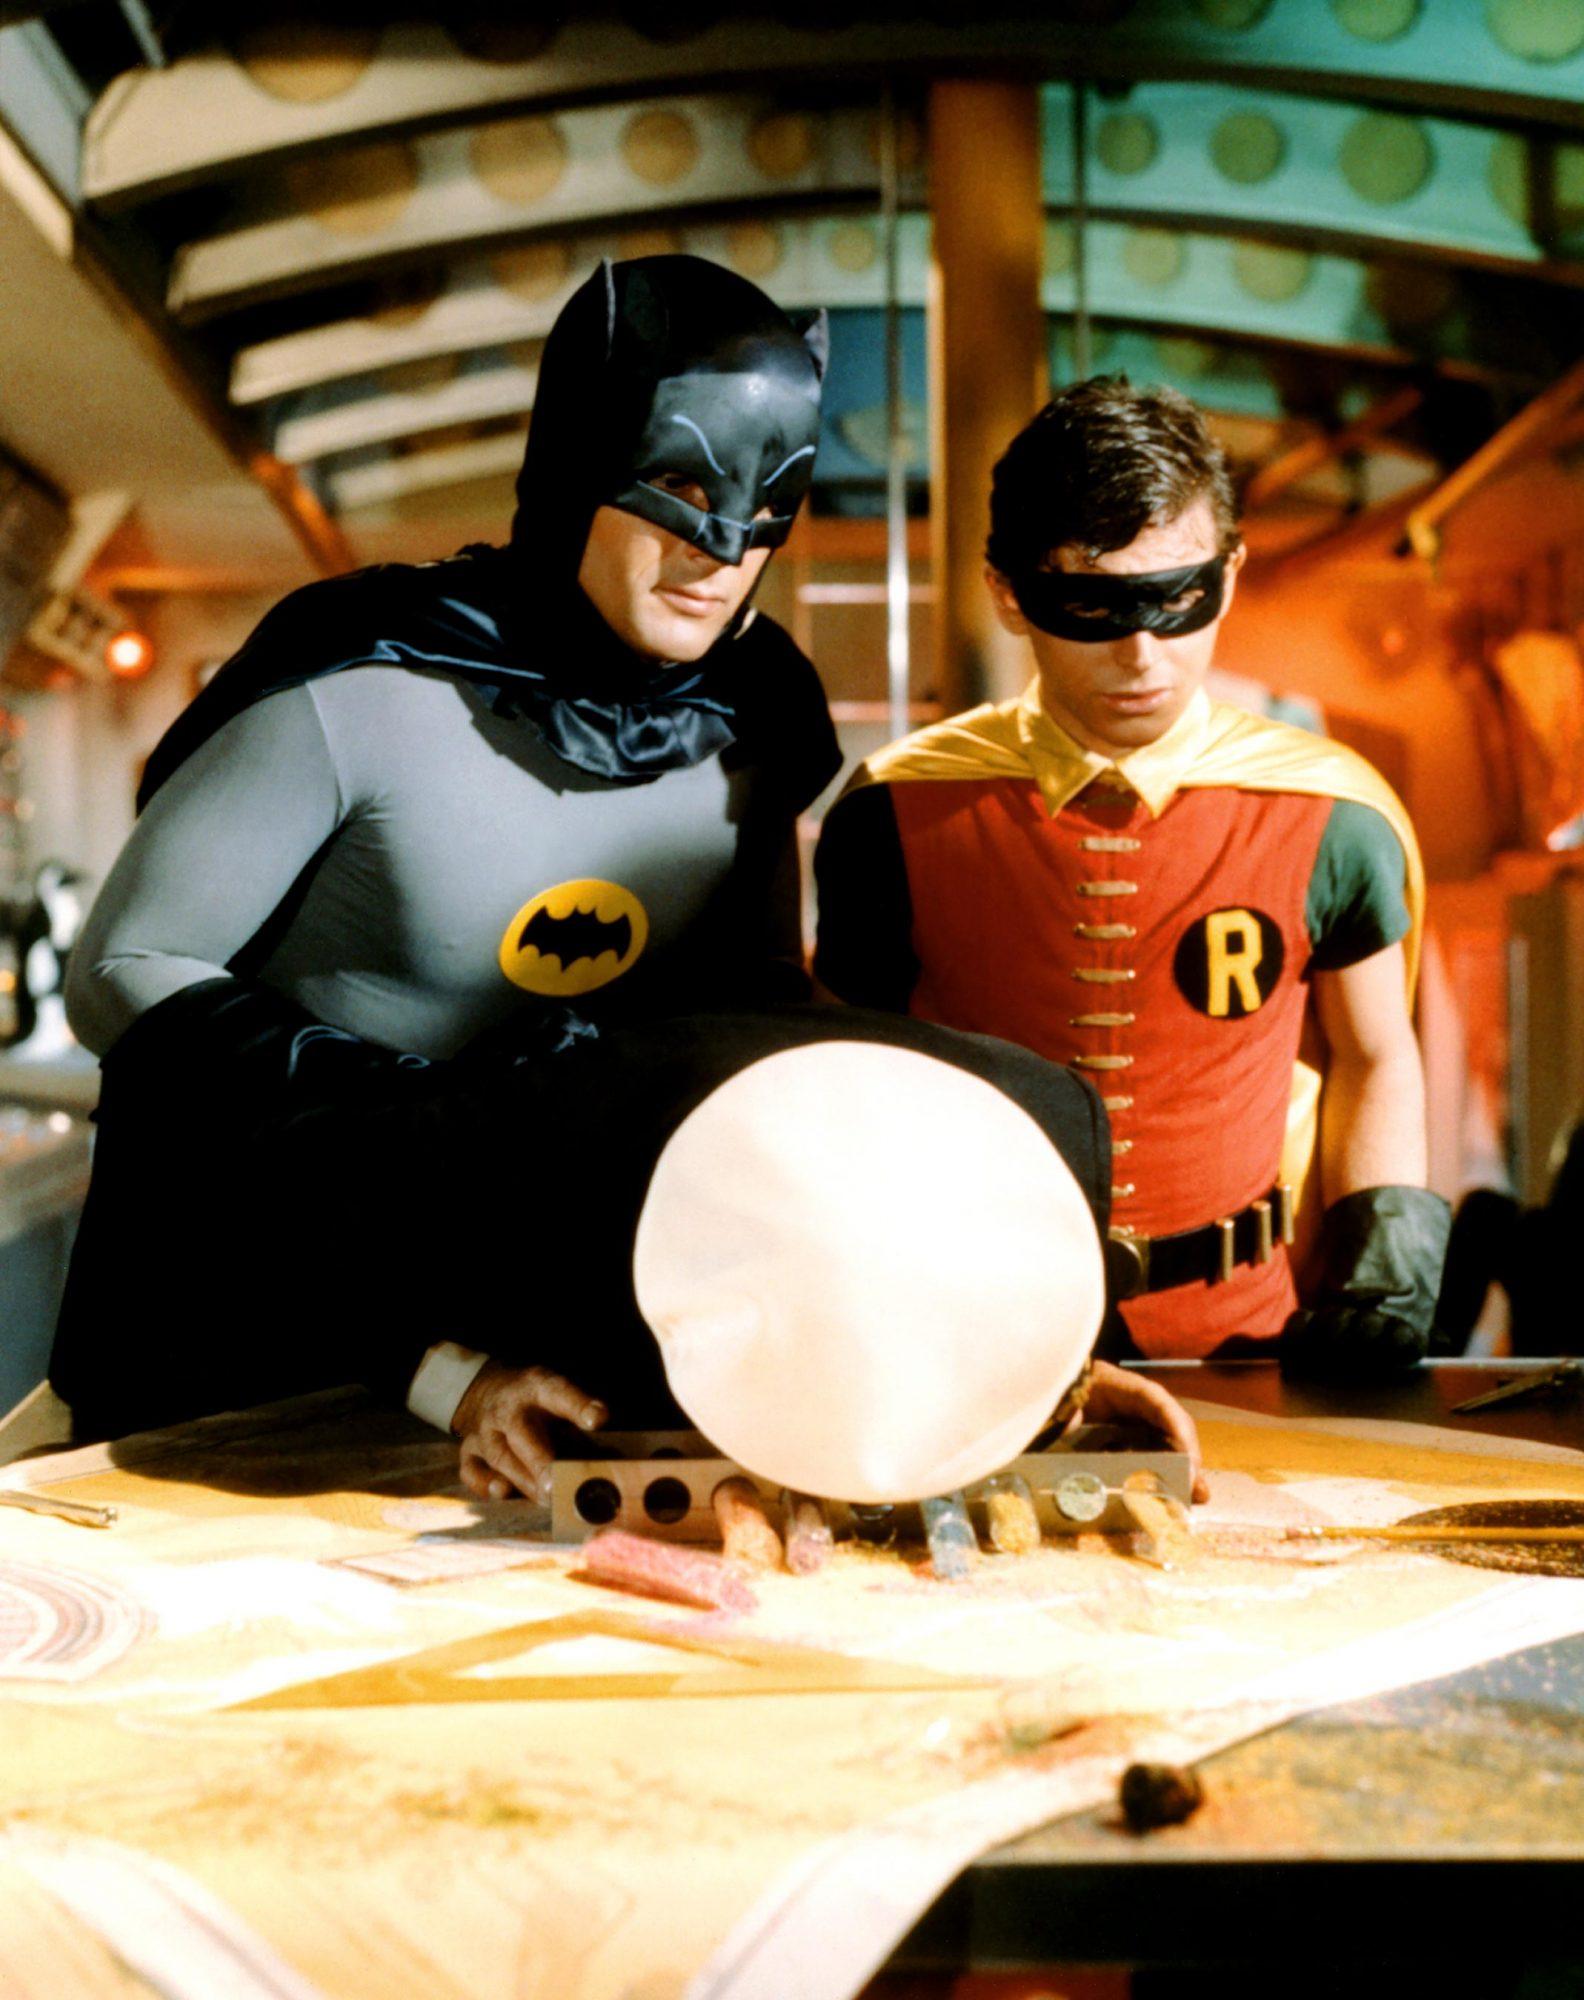 BATMAN, (aka BATMAN: THE MOVIE), Adam West, Reginald Denny (face down), Burt Ward, 1966, TM and Copy